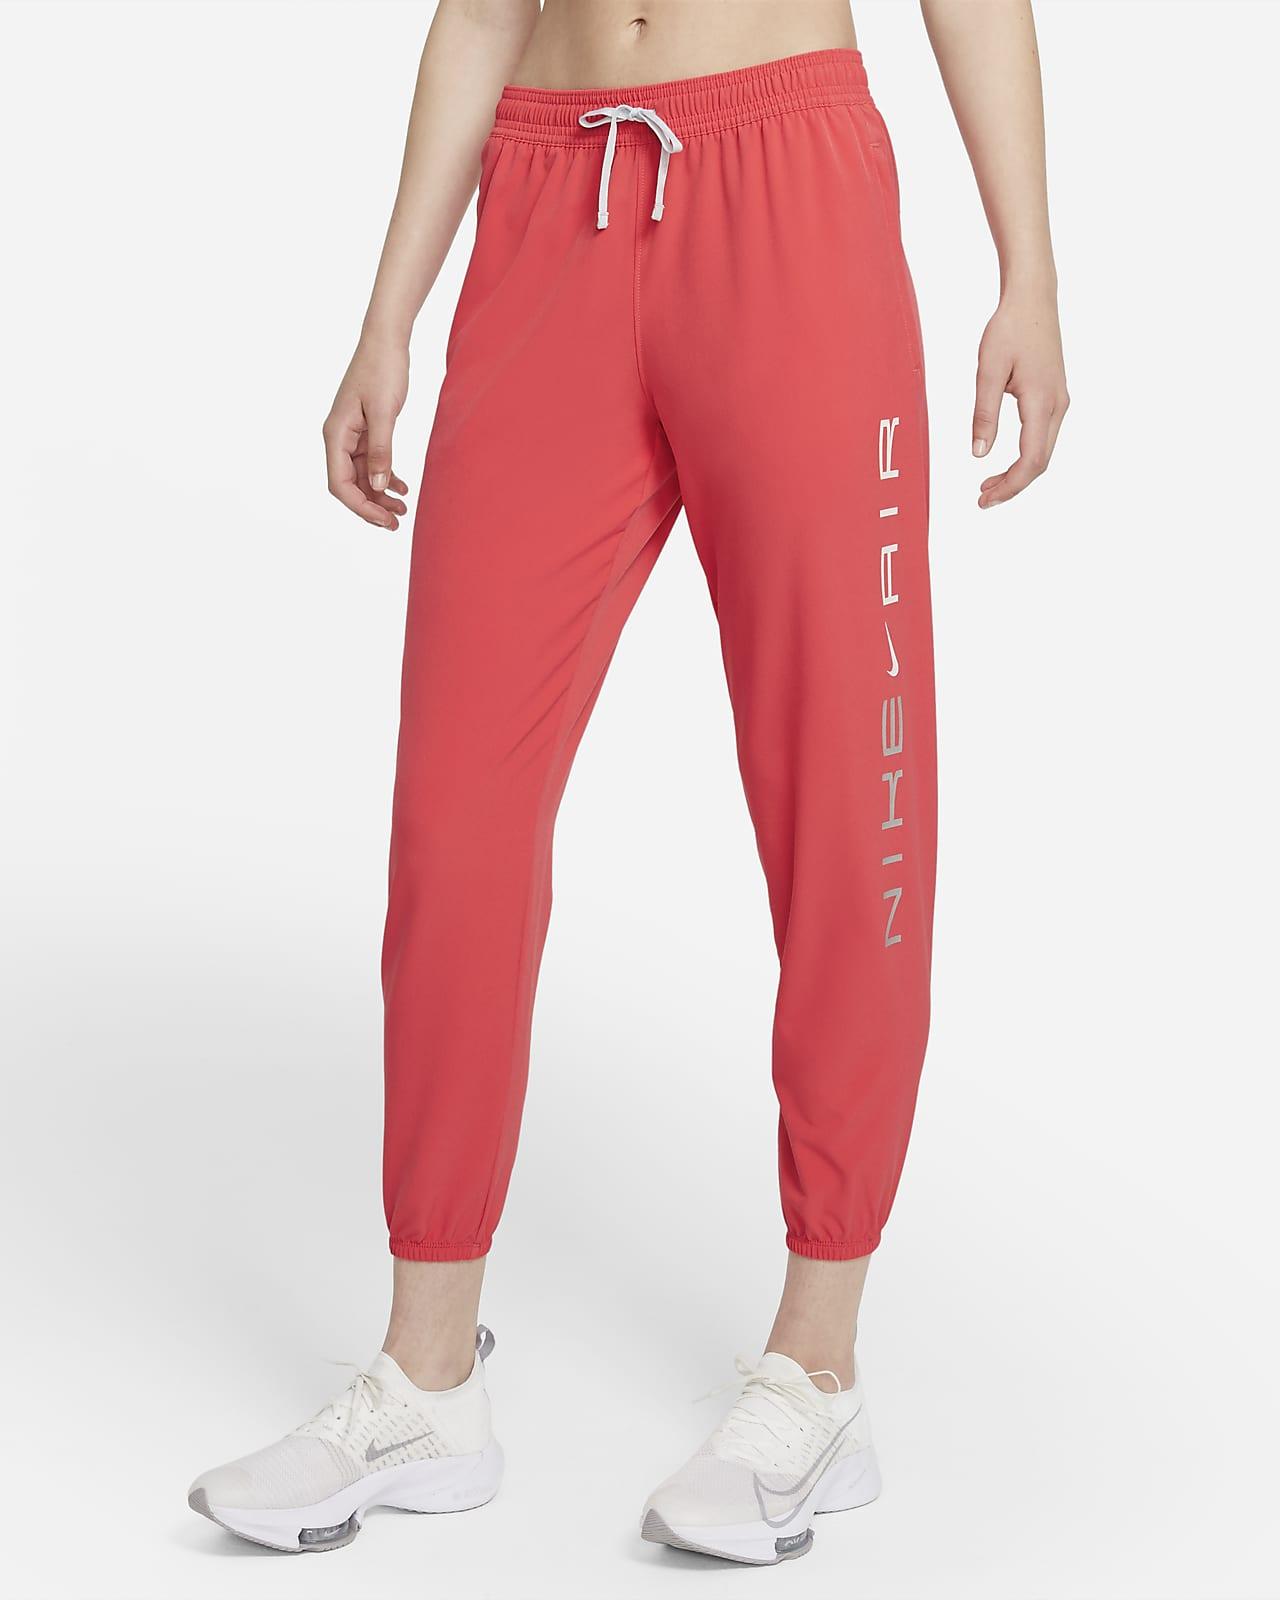 Damska spodnie do biegania Nike Air Dri-FIT